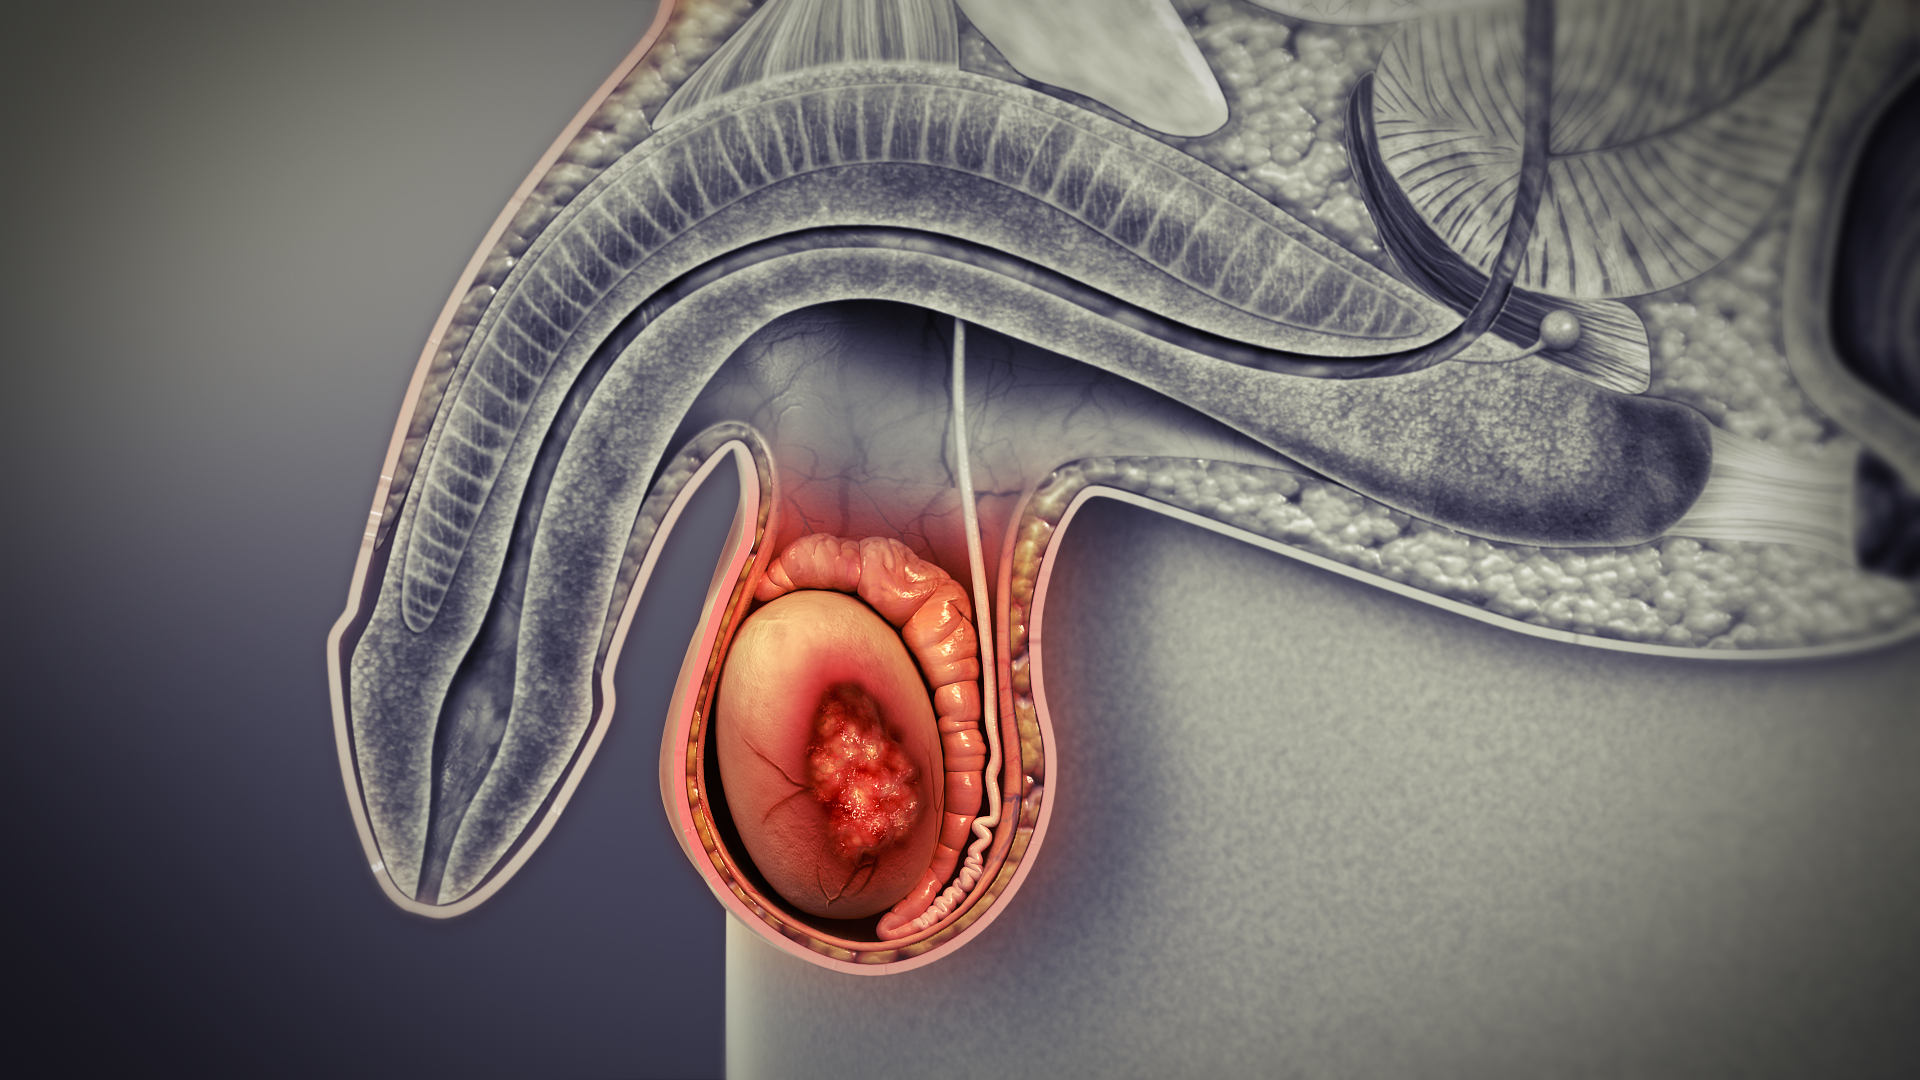 testicular cancer is treatable schistosomiasis bladder cancer